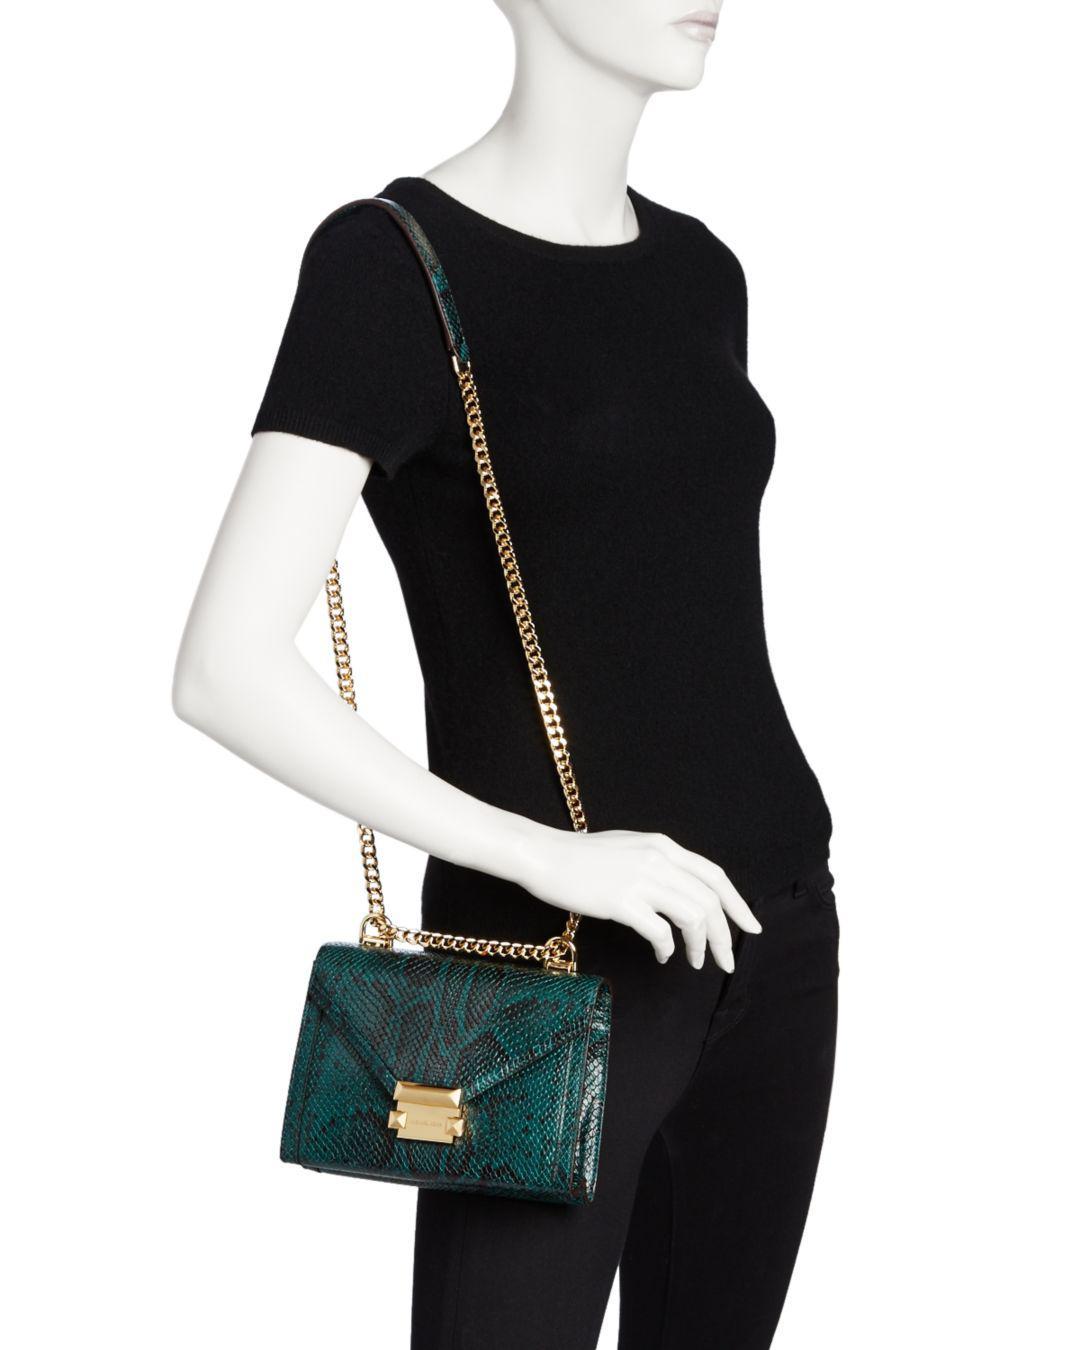 eeedd7dfb400 MICHAEL Michael Kors Whitney Small Leather Shoulder Bag - Lyst